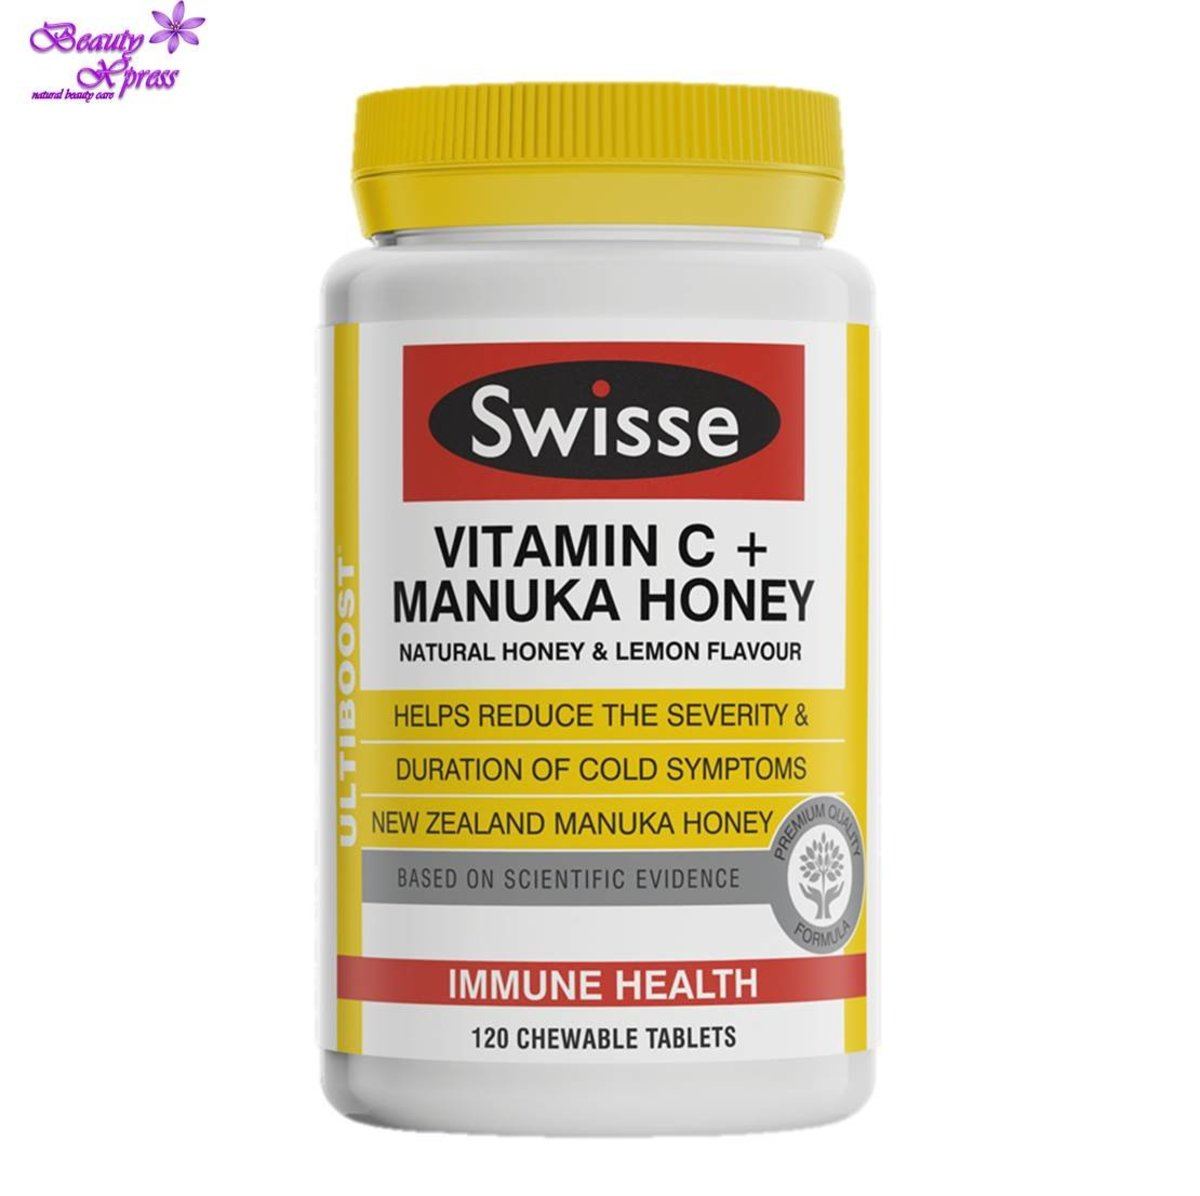 Ultiboost Vitamin C + Manuka Honey 120's (Expiry Date: 7/20)